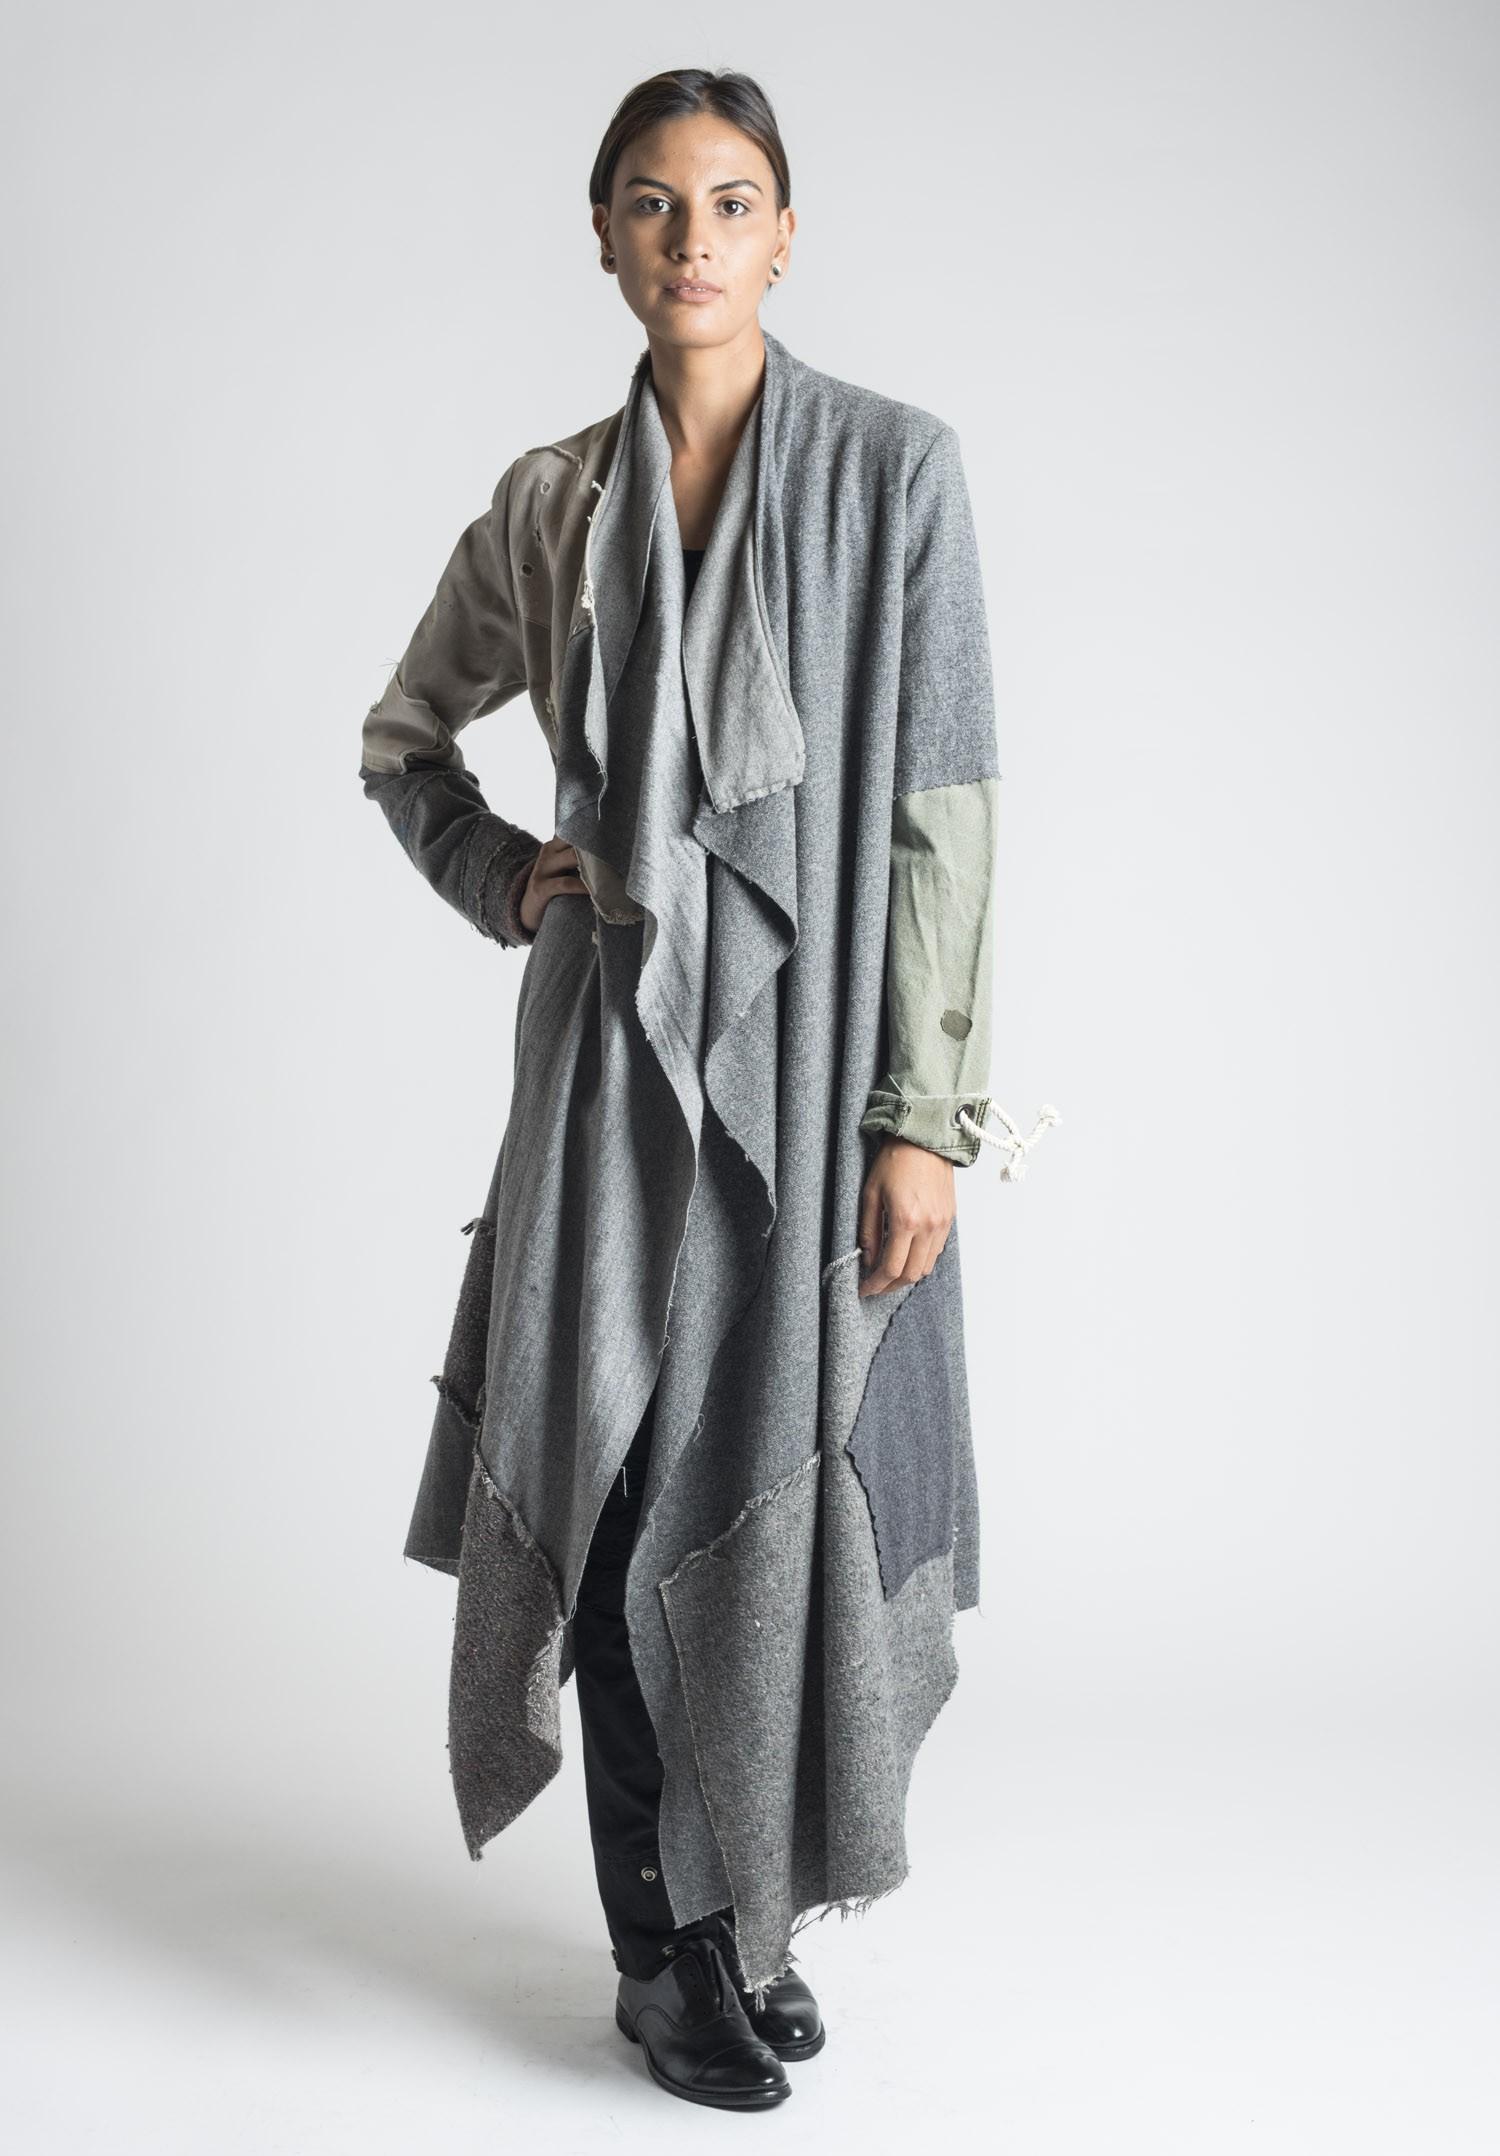 Santa Fe For Sale >> Greg Lauren Nomad Patchwork Coat in Grey | Santa Fe Dry Goods Trippen, Rundholz, Avant Toi, Greg ...